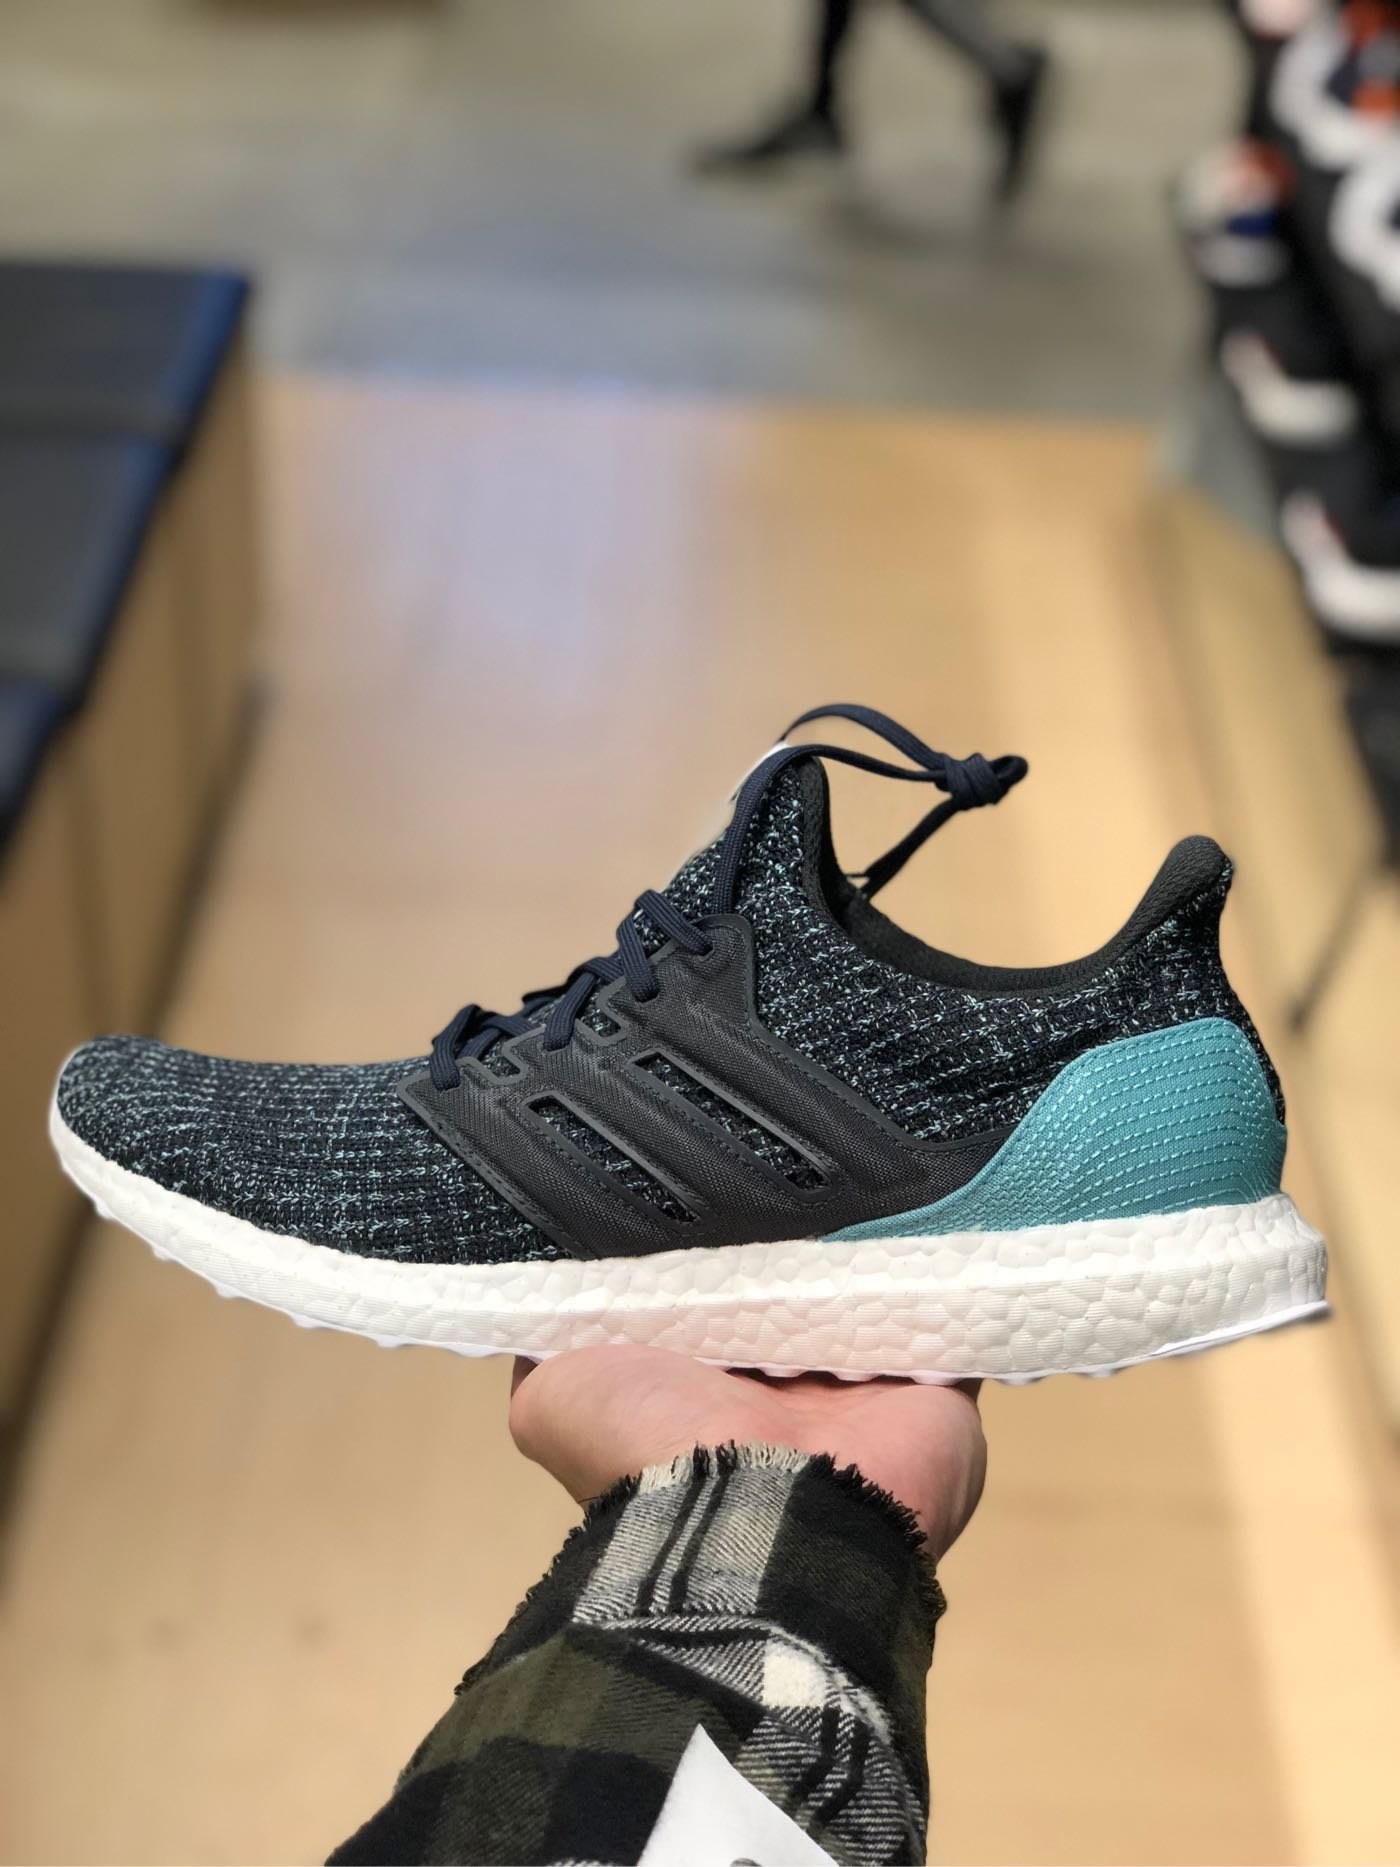 fd2aa577d4940 Cheers  Adidas Ultra Boost x parley 海洋環保材質聯名限量鞋款CG3673 ...